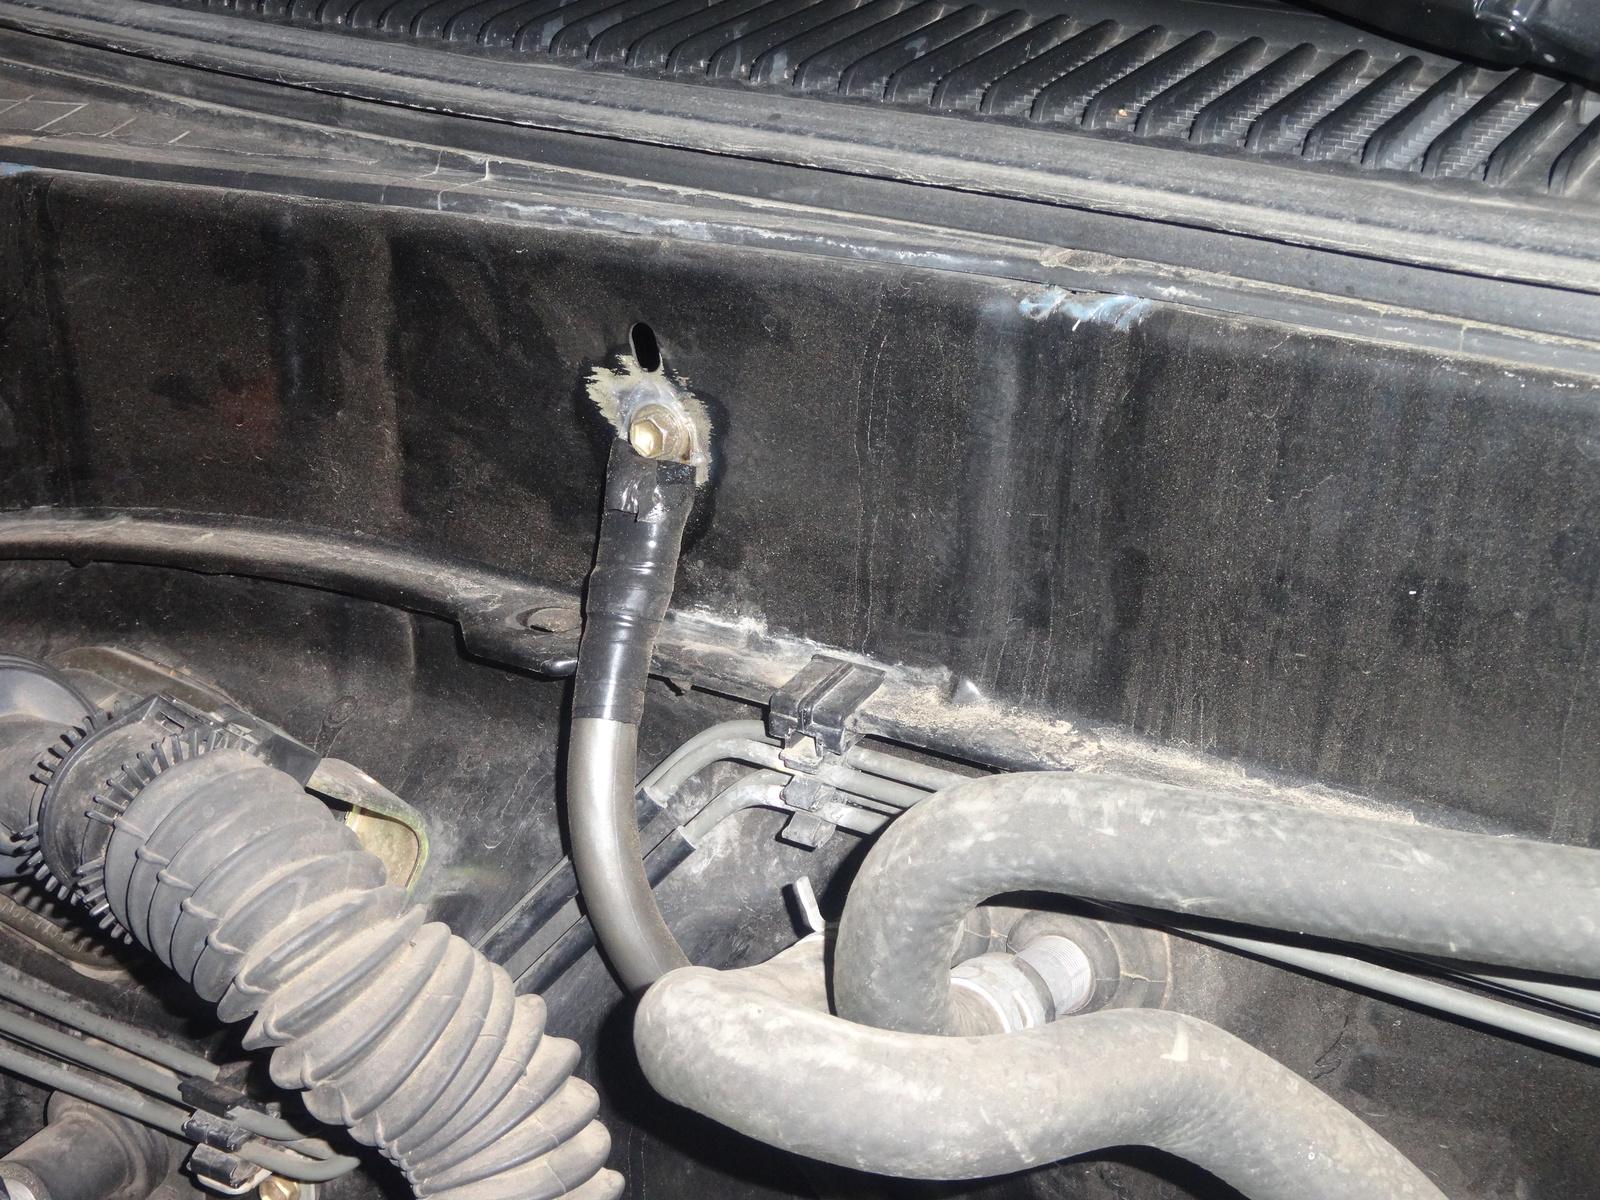 Electrical Problem Battery/Alternator?   Toyota Tundra Forums